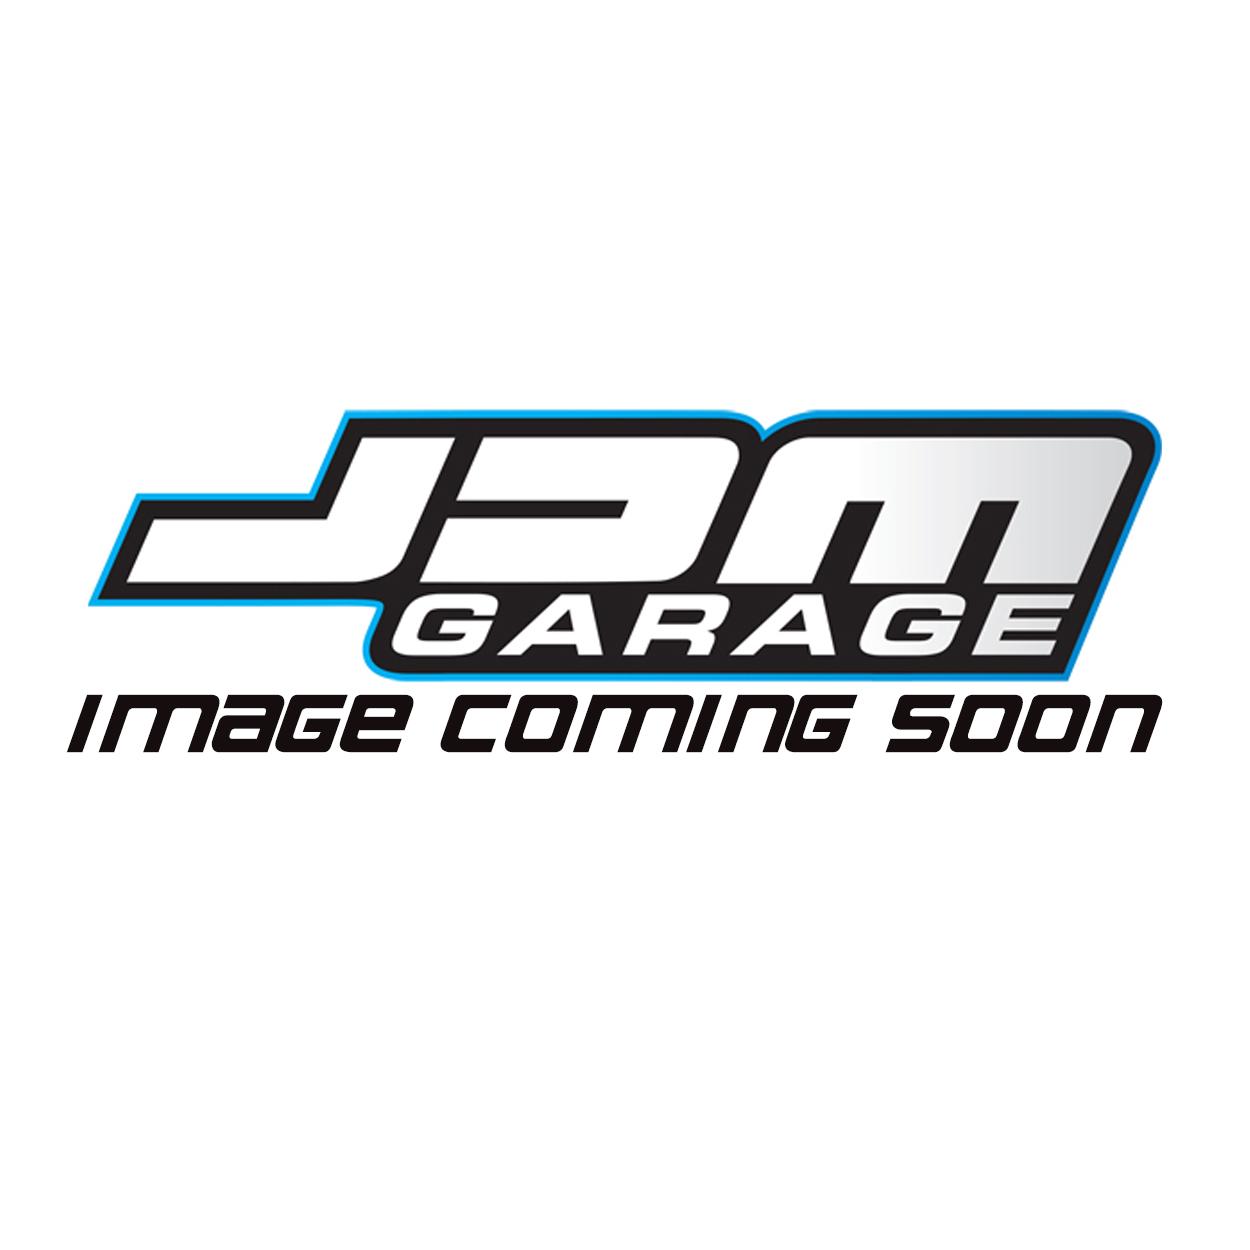 JDM Garage Vintage Trucker Snap Back Cap - White / Black Mesh